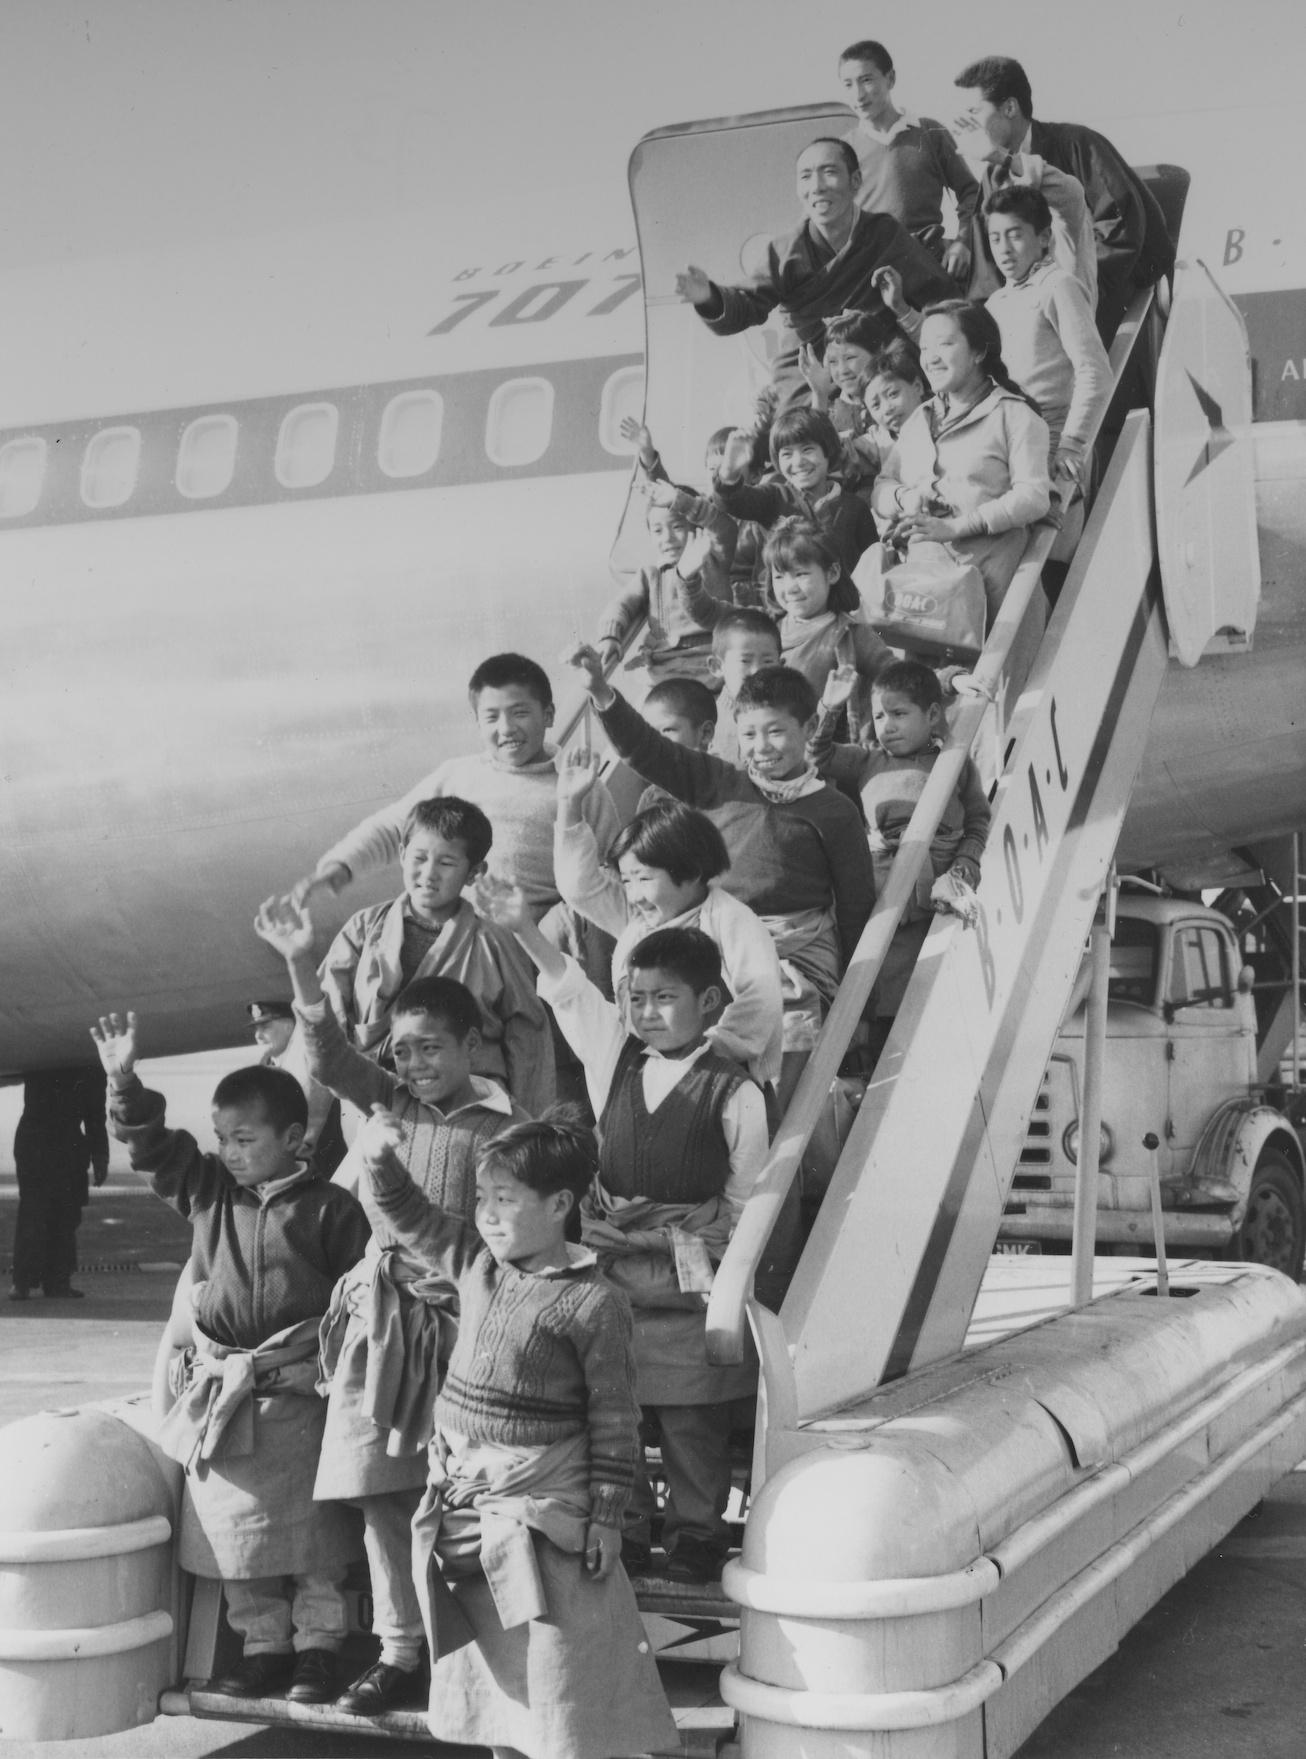 The Children - The Early Pestalozzi Children Project